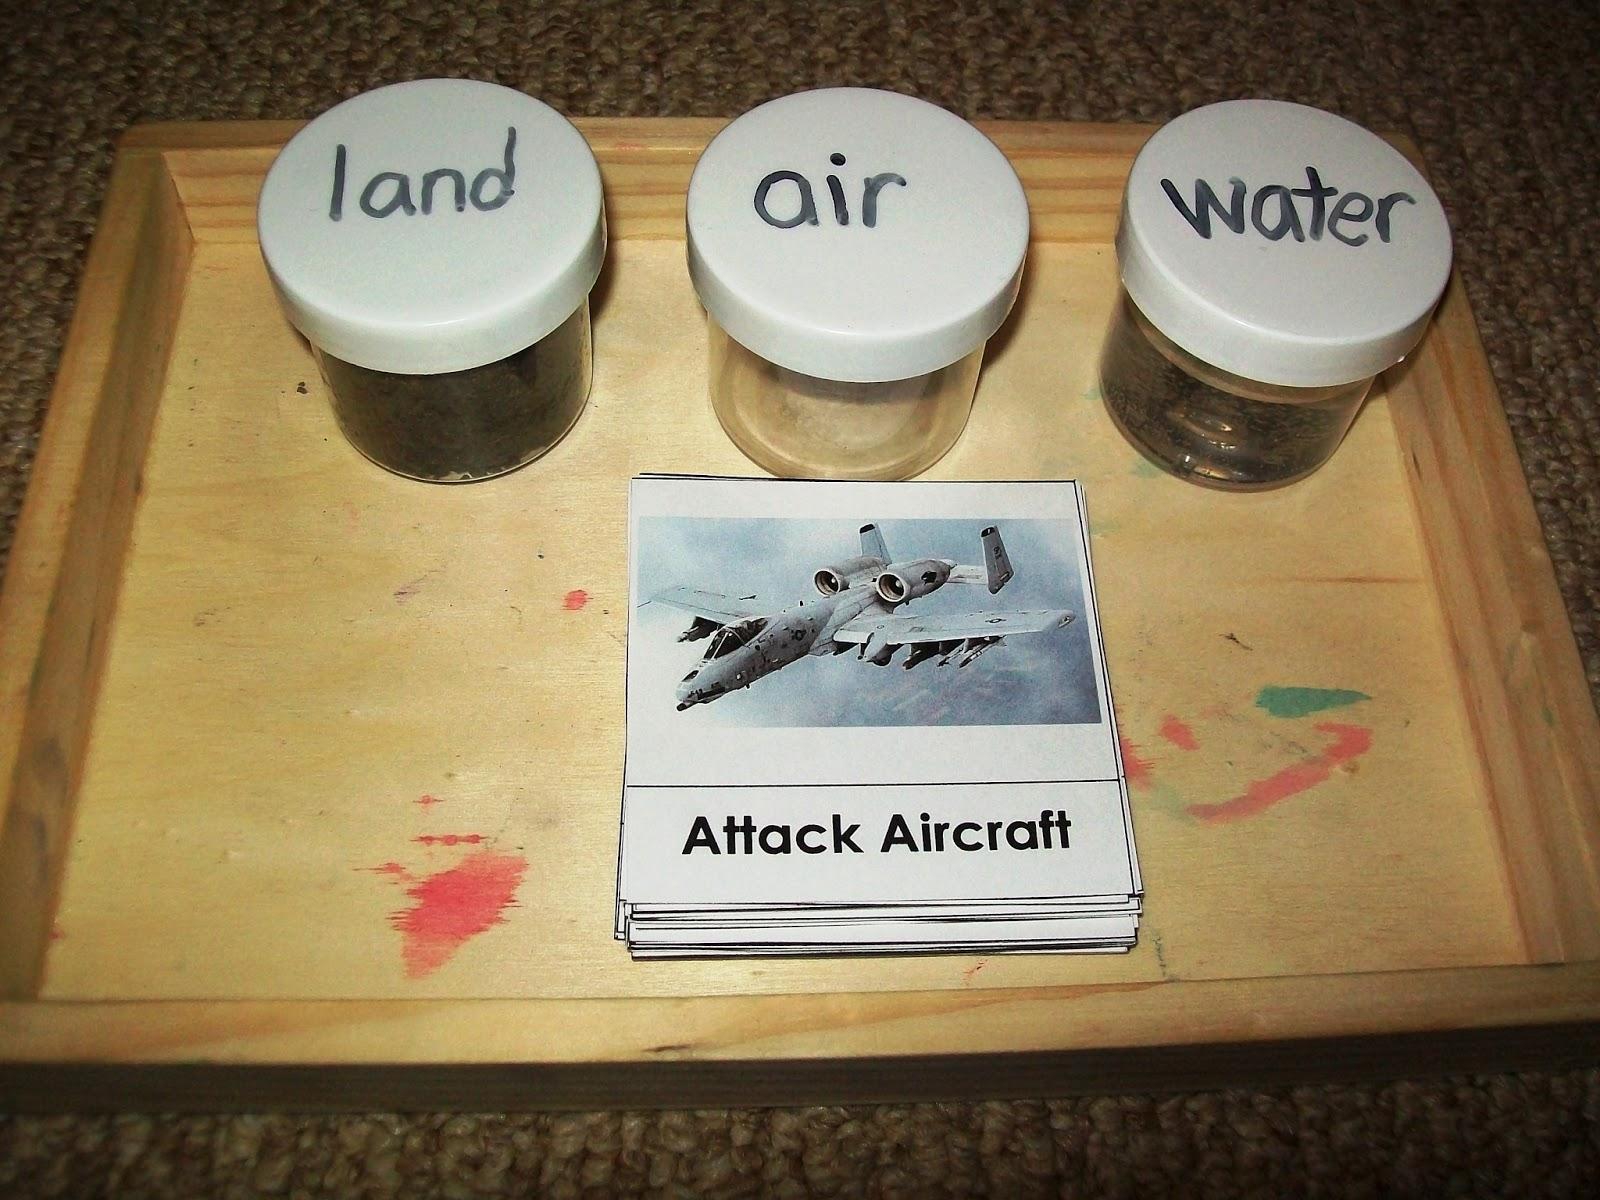 Worksheet Vehicles Air Land Water